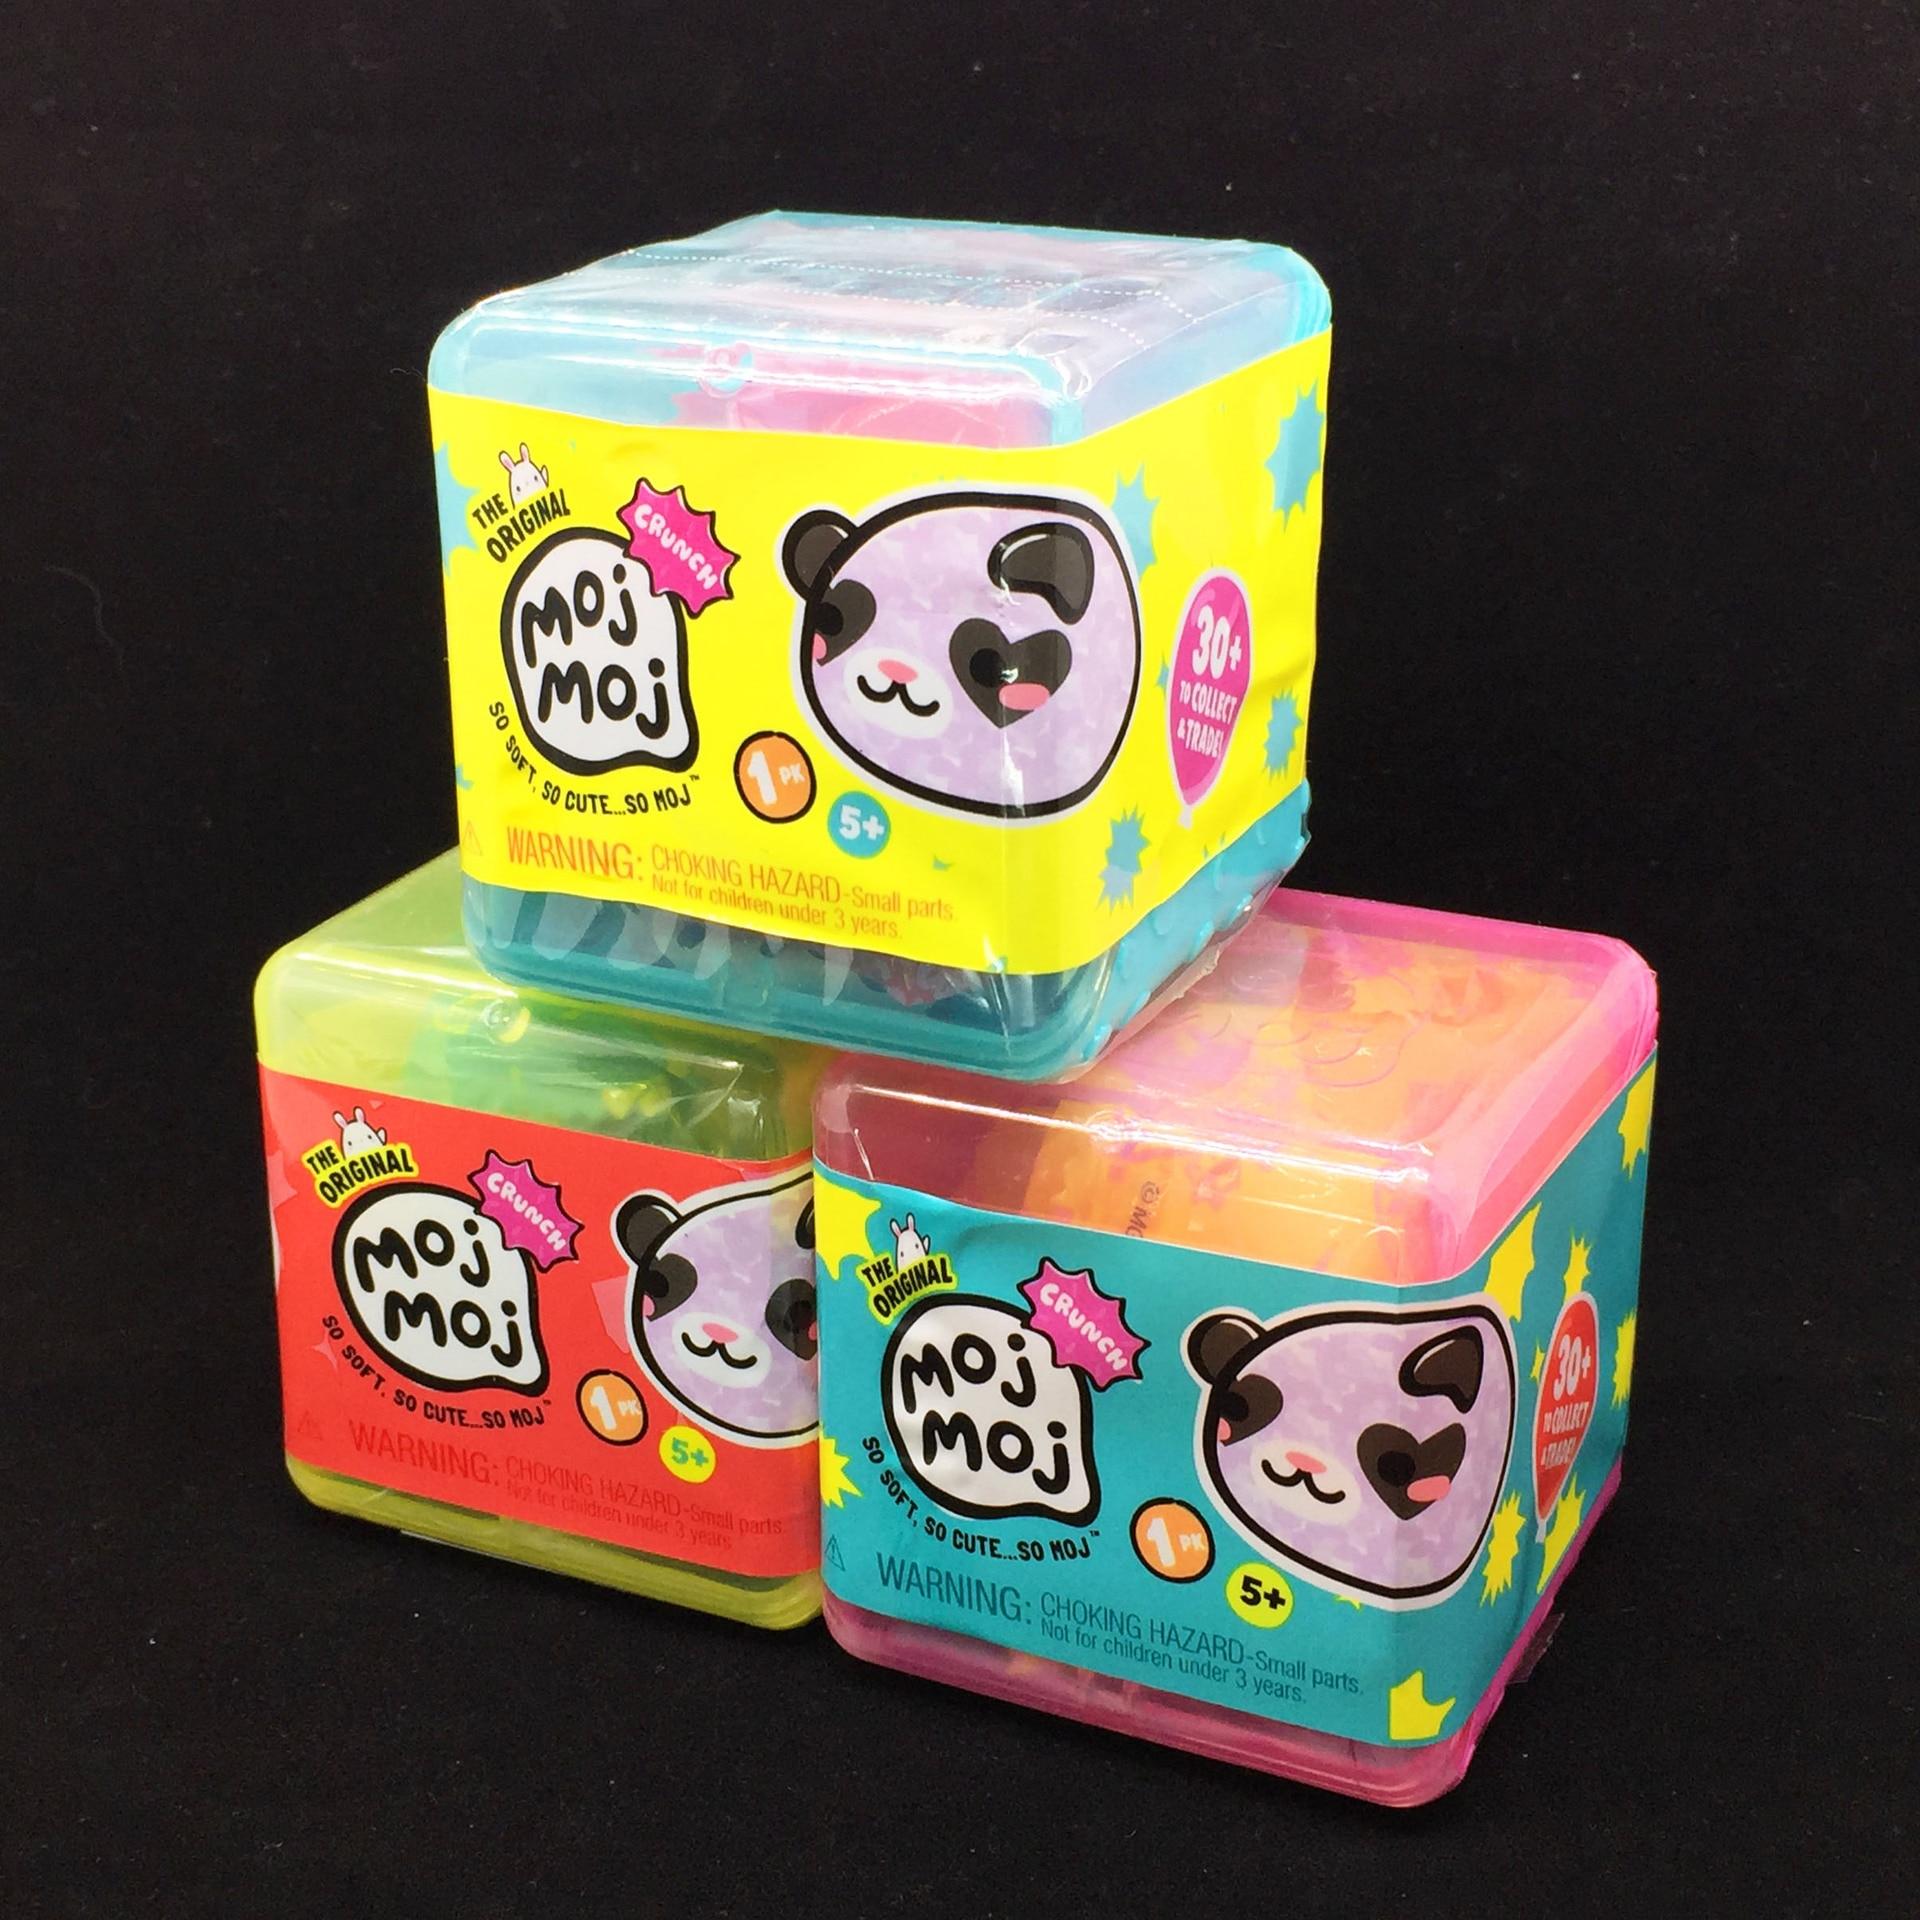 Newest Original Soft Mojmoj Blind Boxes Random Relaxation Toy Blind Eggs Soft Moji Gift For Children